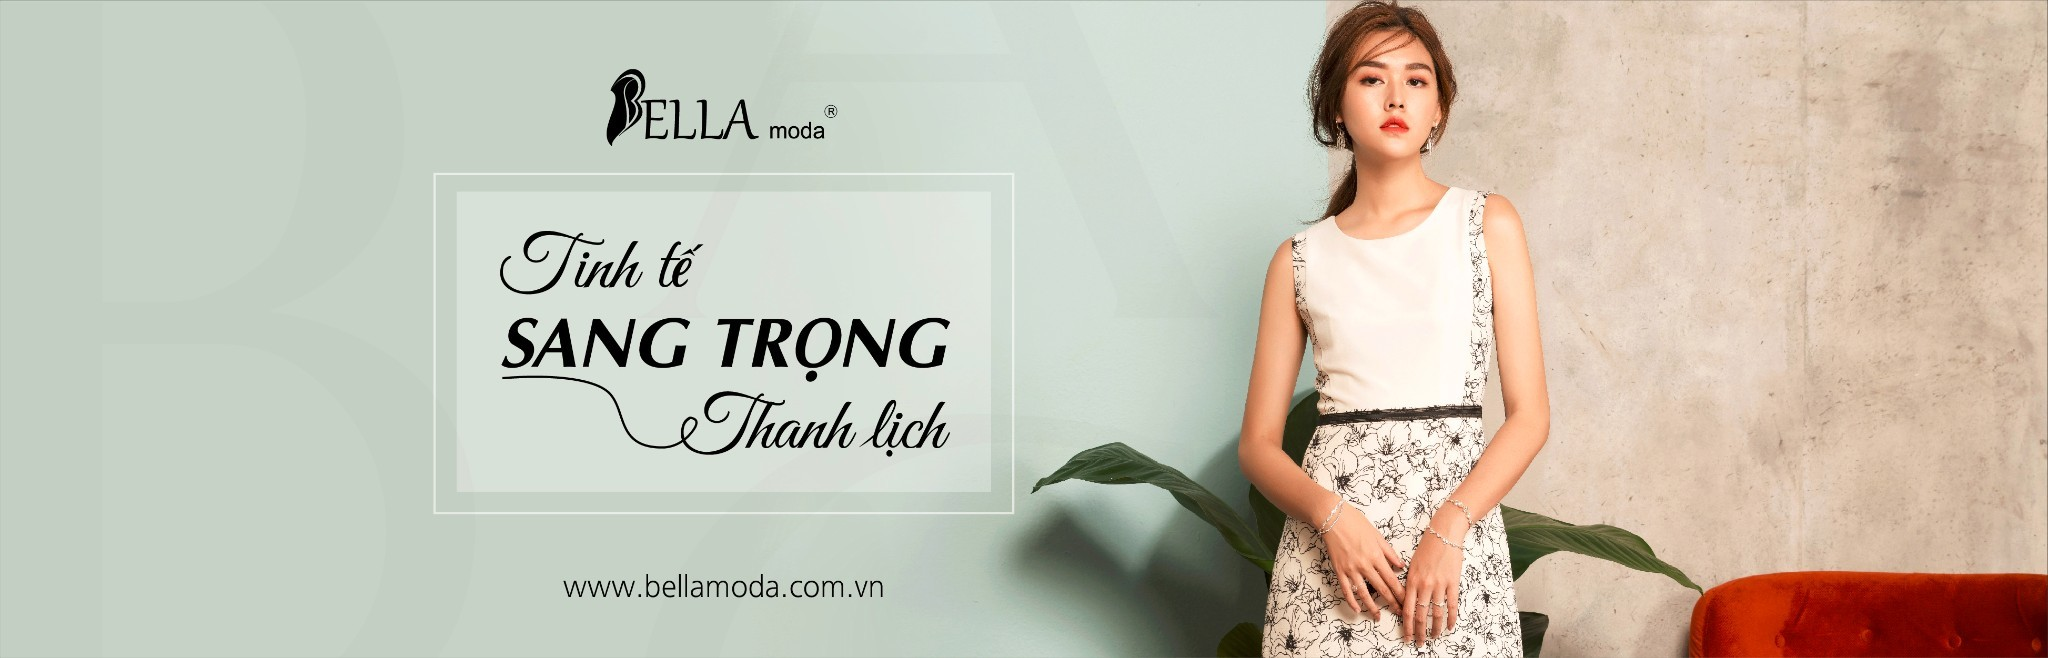 Giới thiệu thời trang Bella Moda